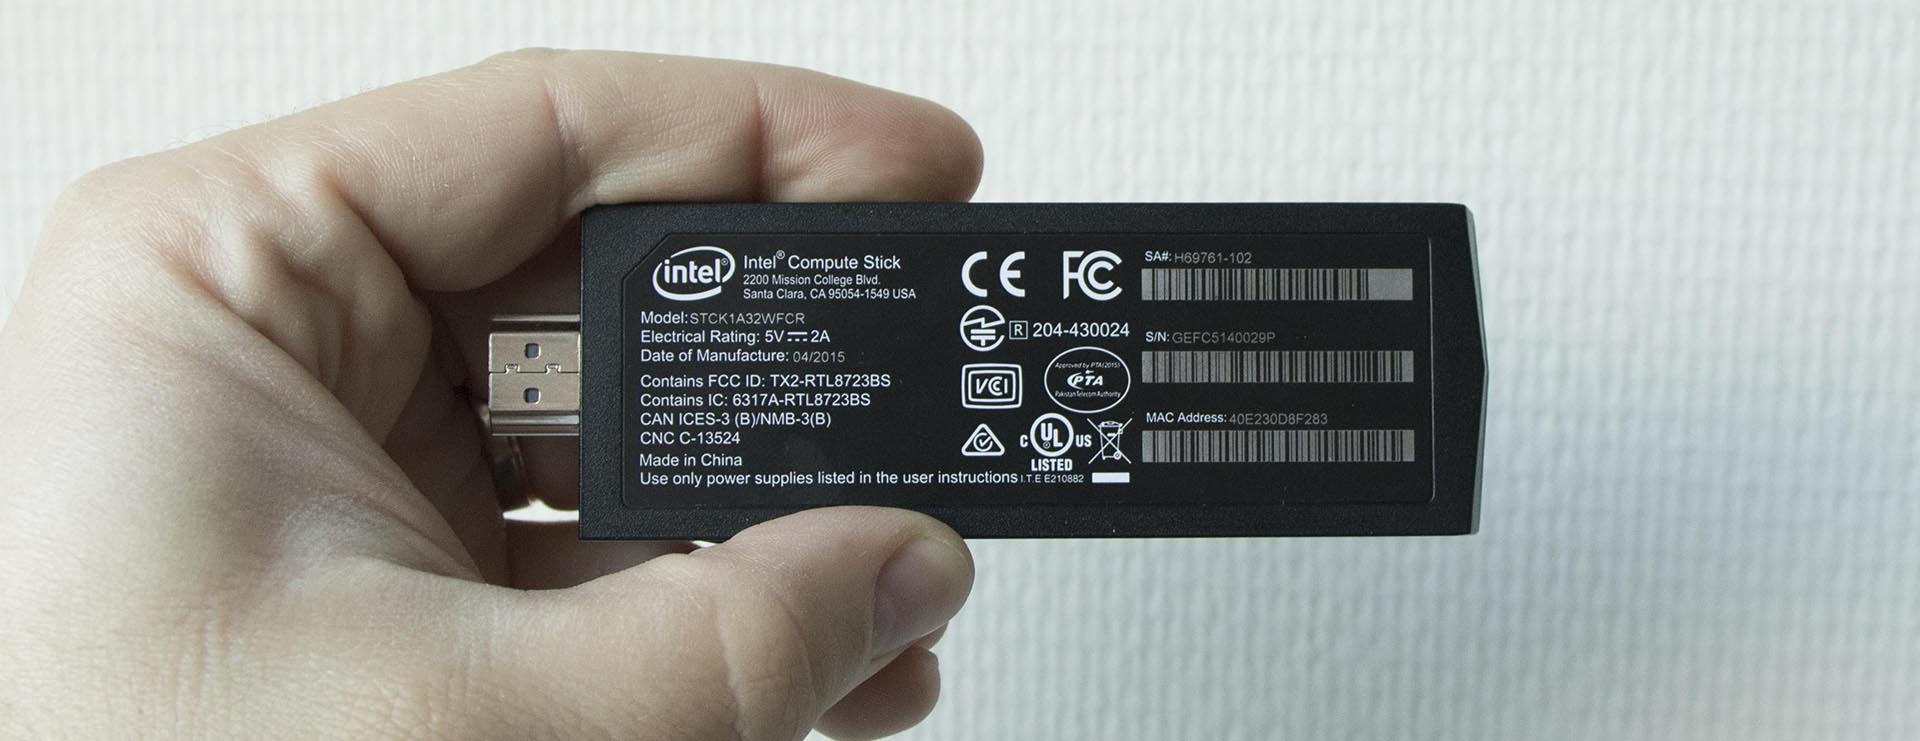 Intel Compute Stick IMG_7797